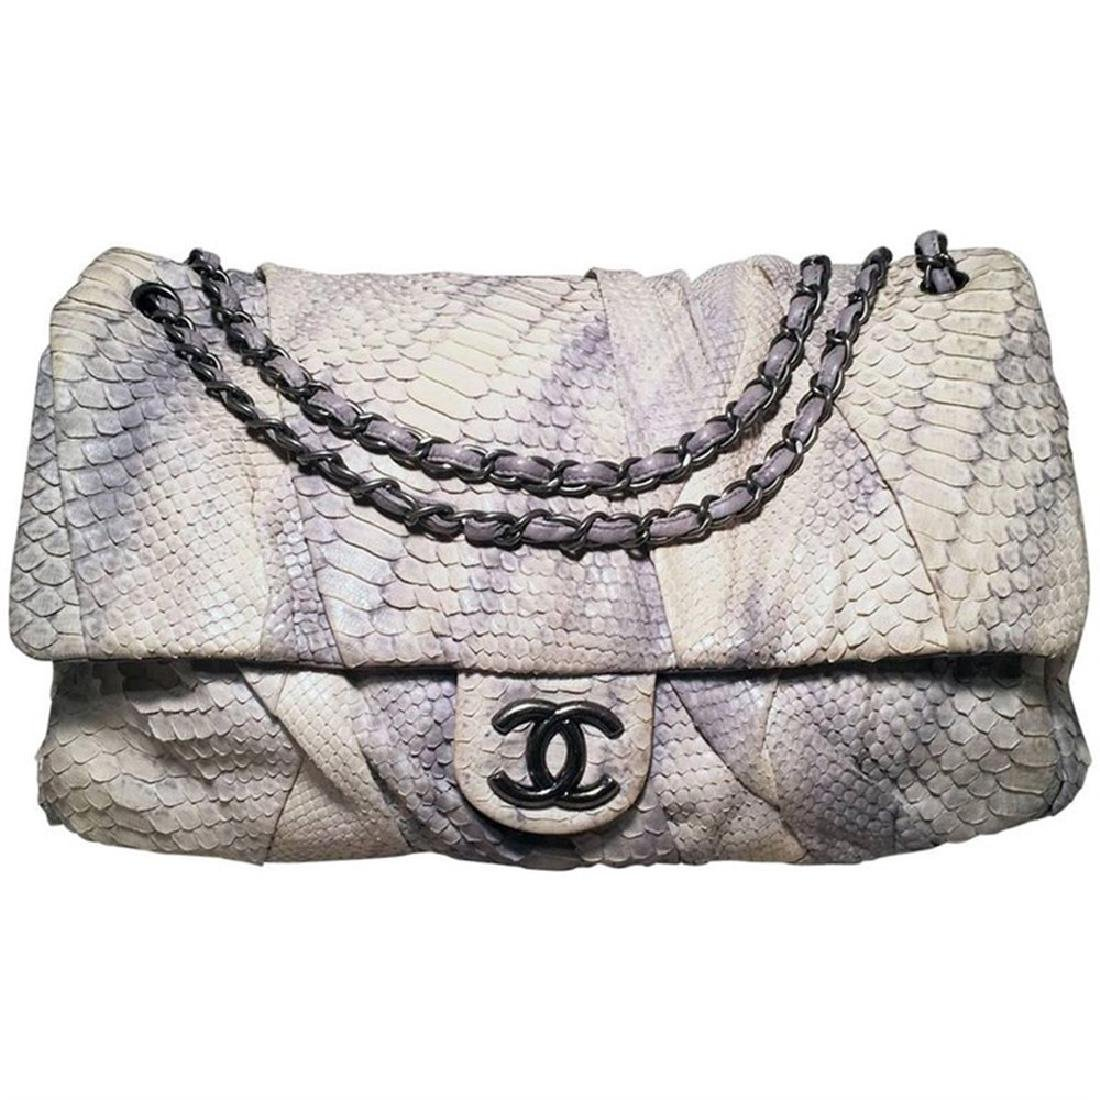 Chanel Rare Natural Snakeskin Python XL Classic Flap